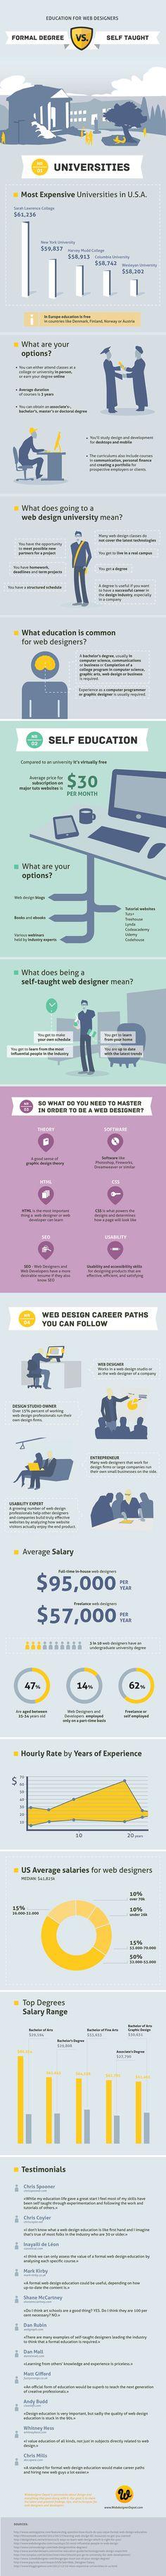 Formal degree vs. Self taught #infographic